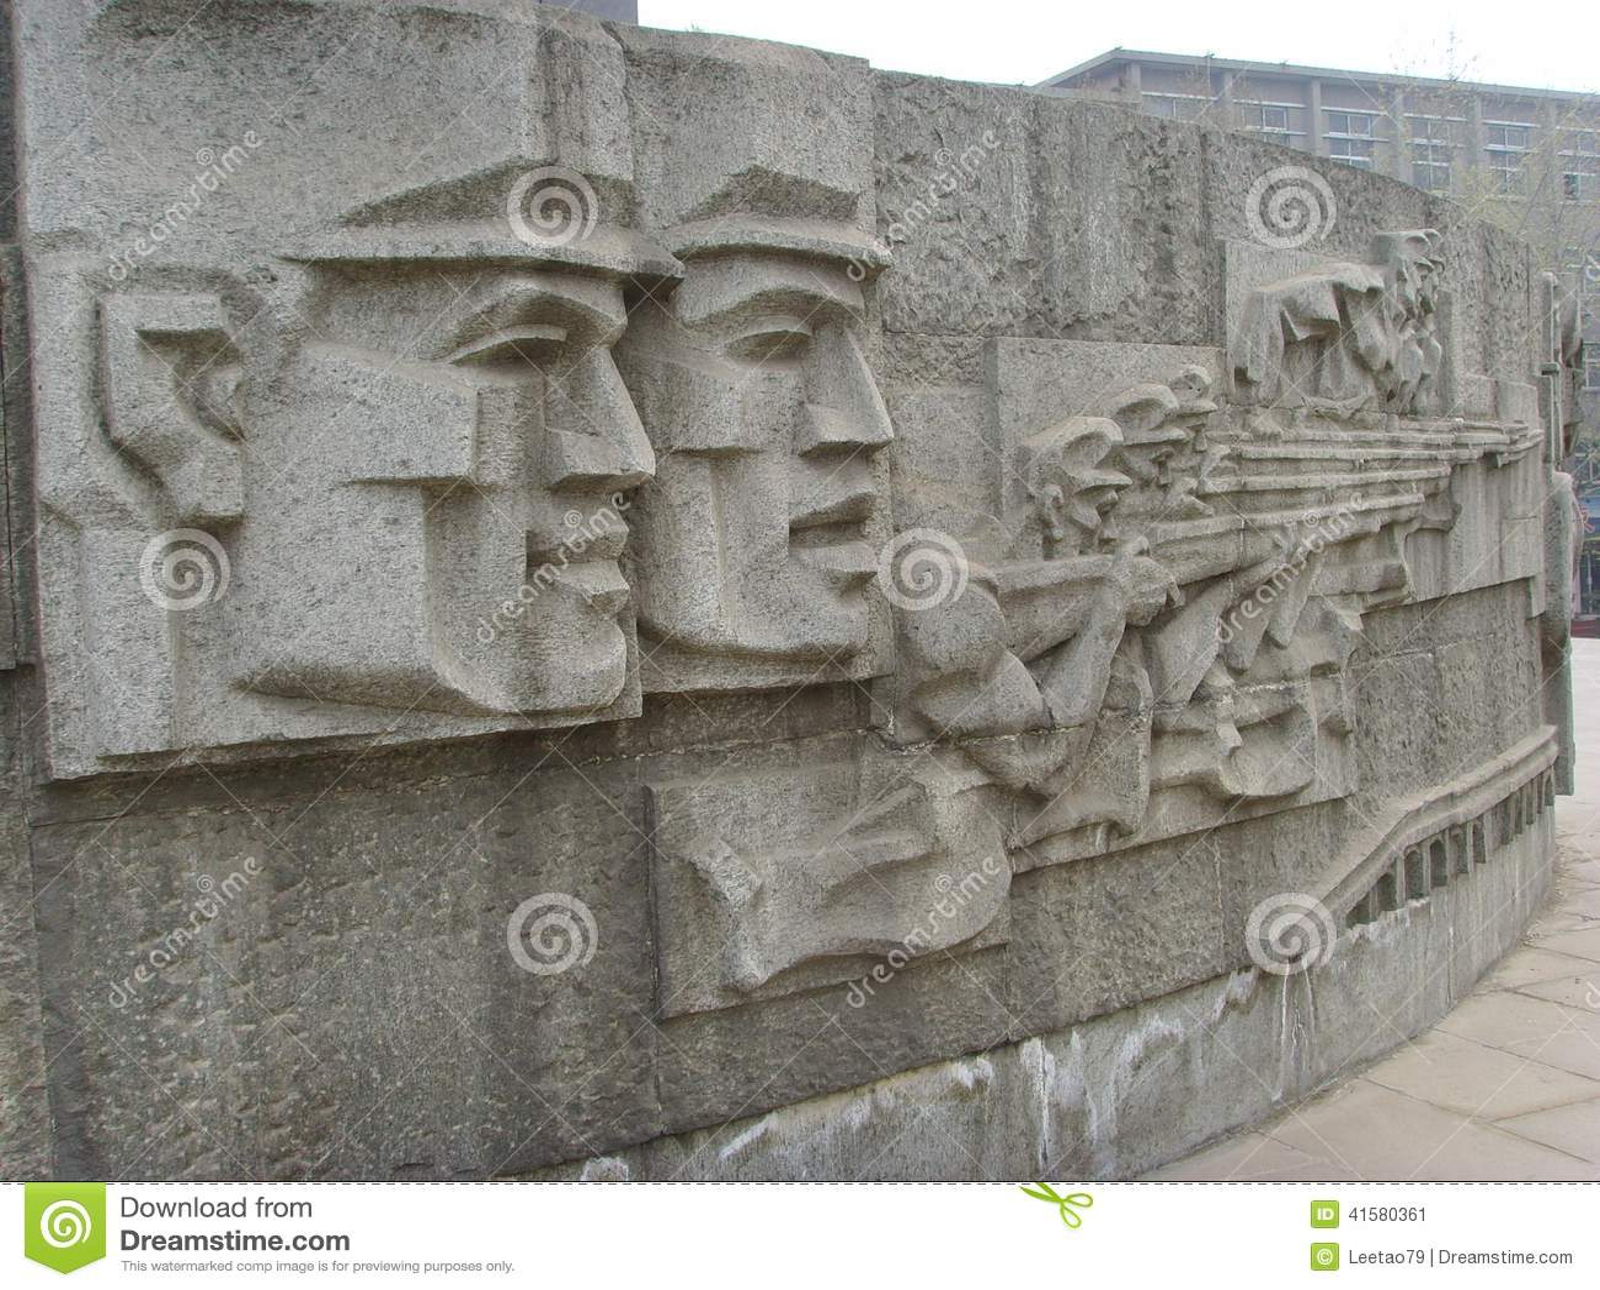 Shijiazhuang, Befreiungs-Monument